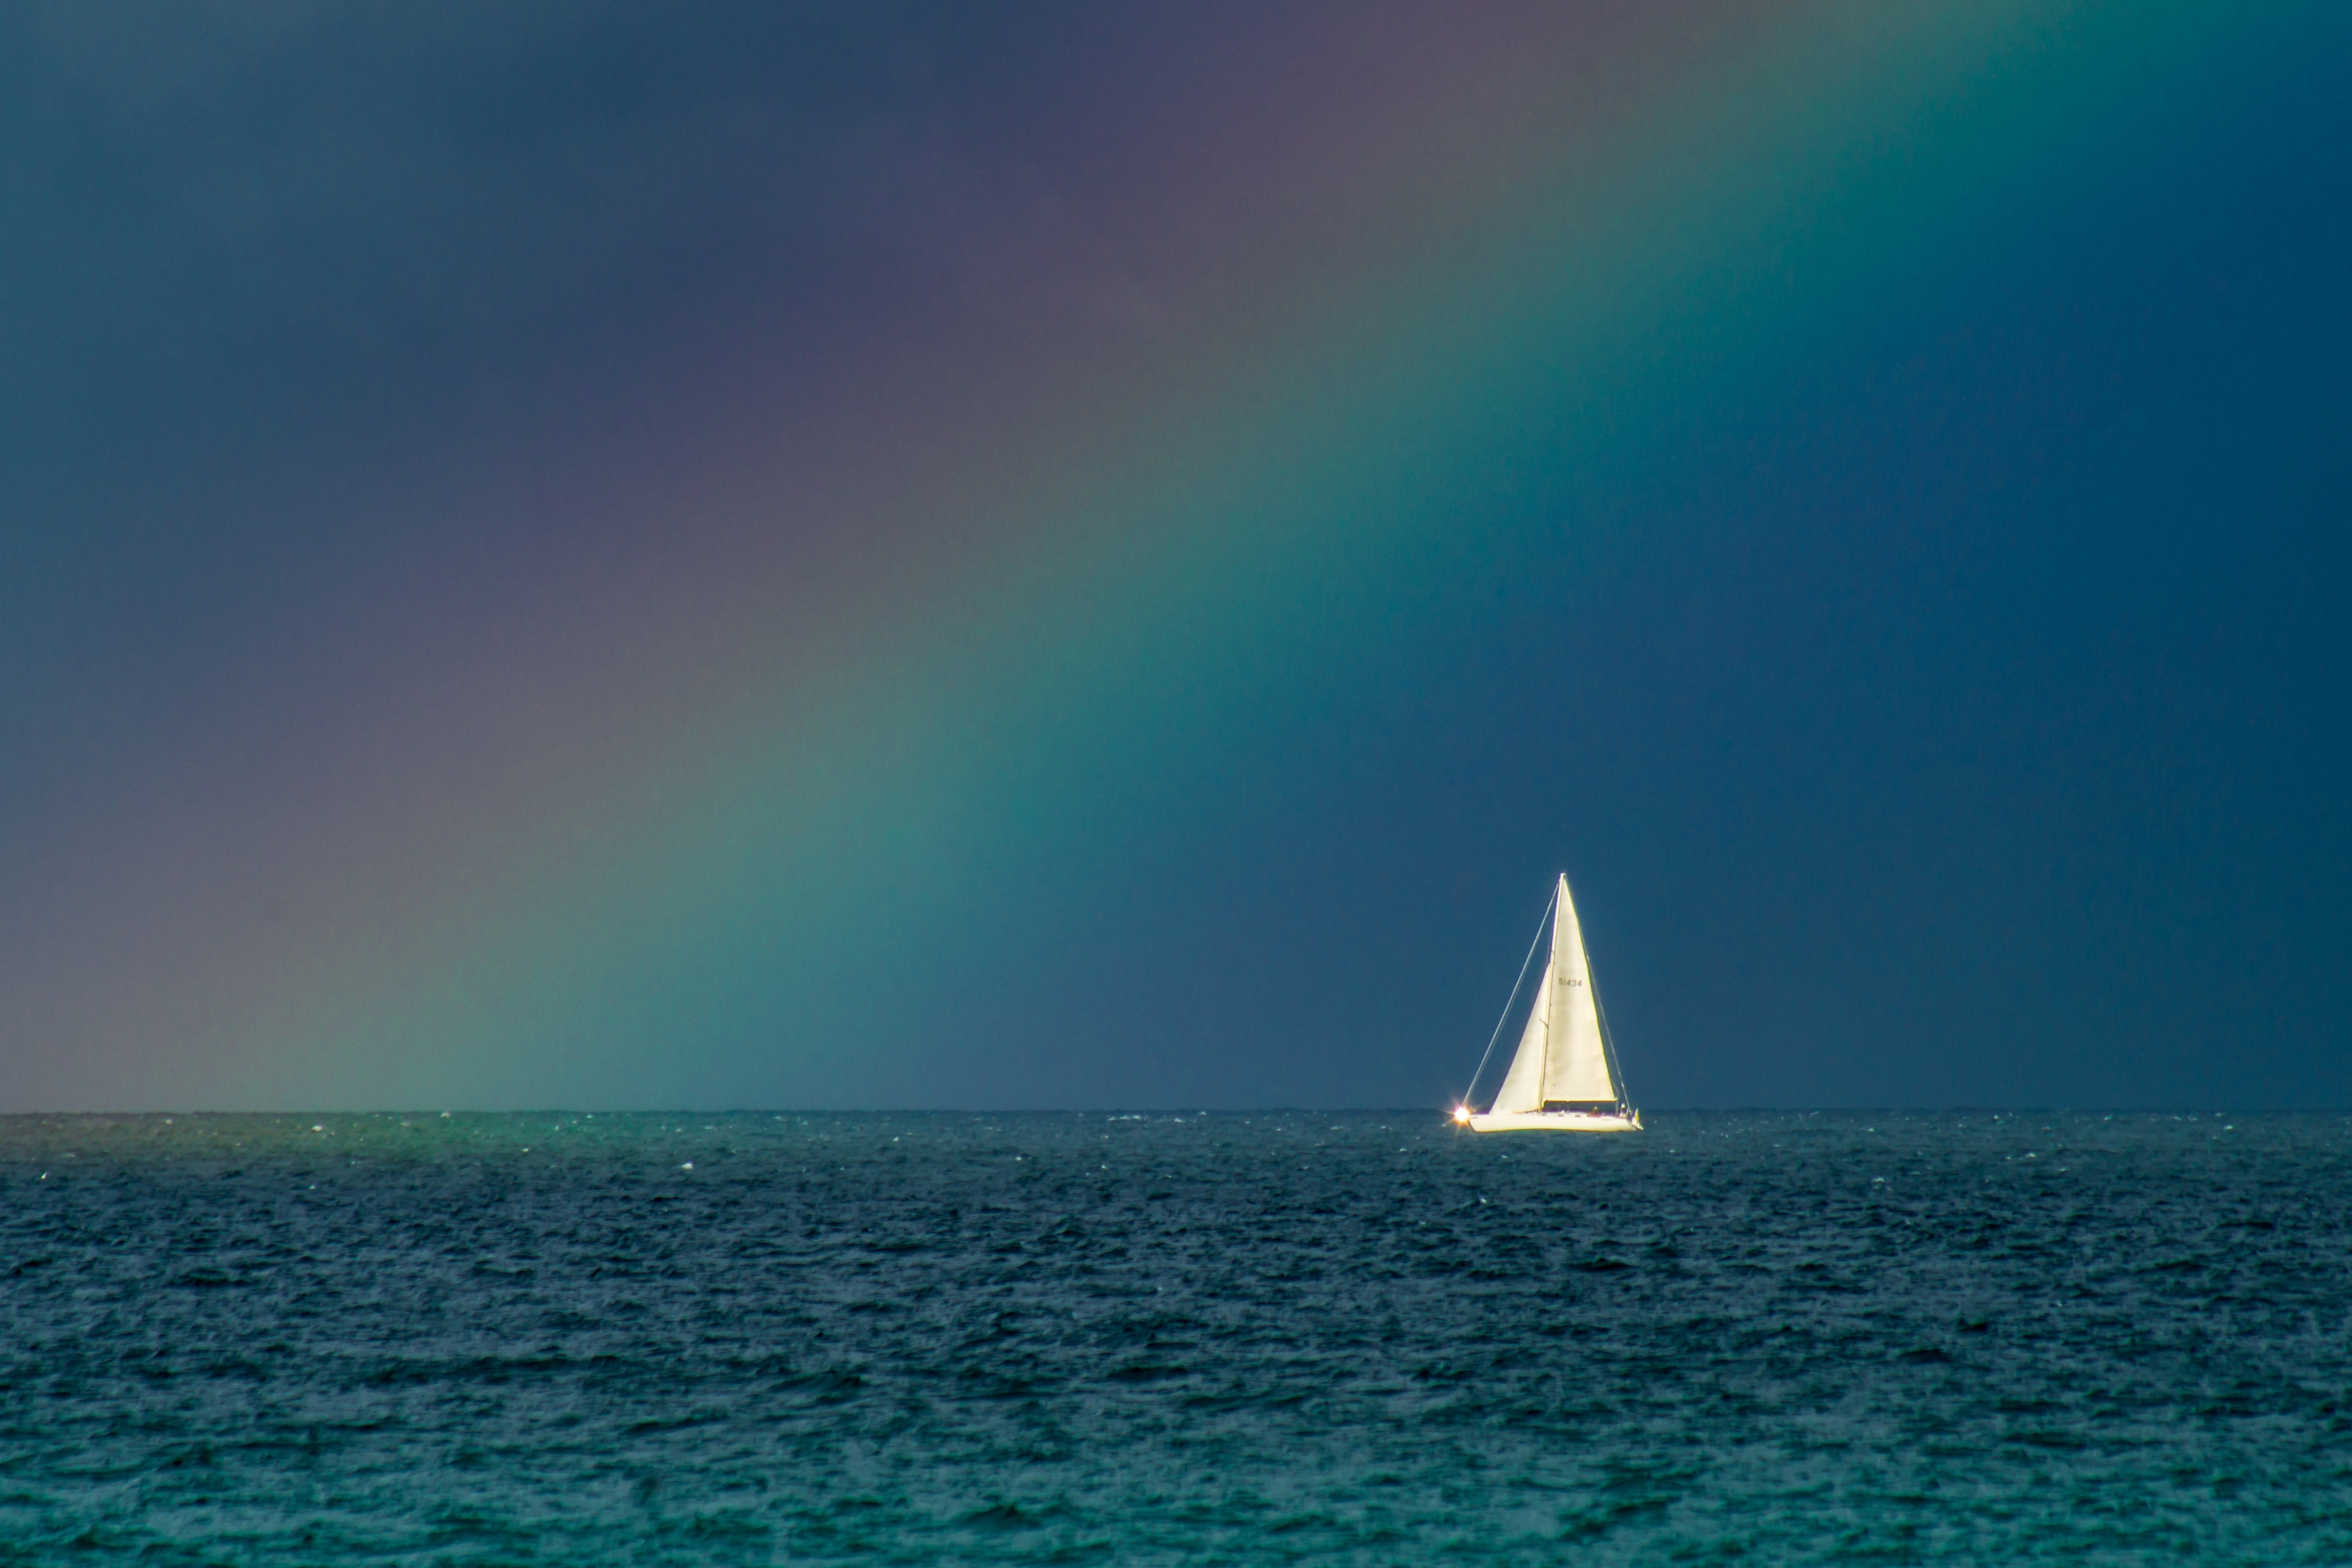 Singer Island, Florida, United States of America